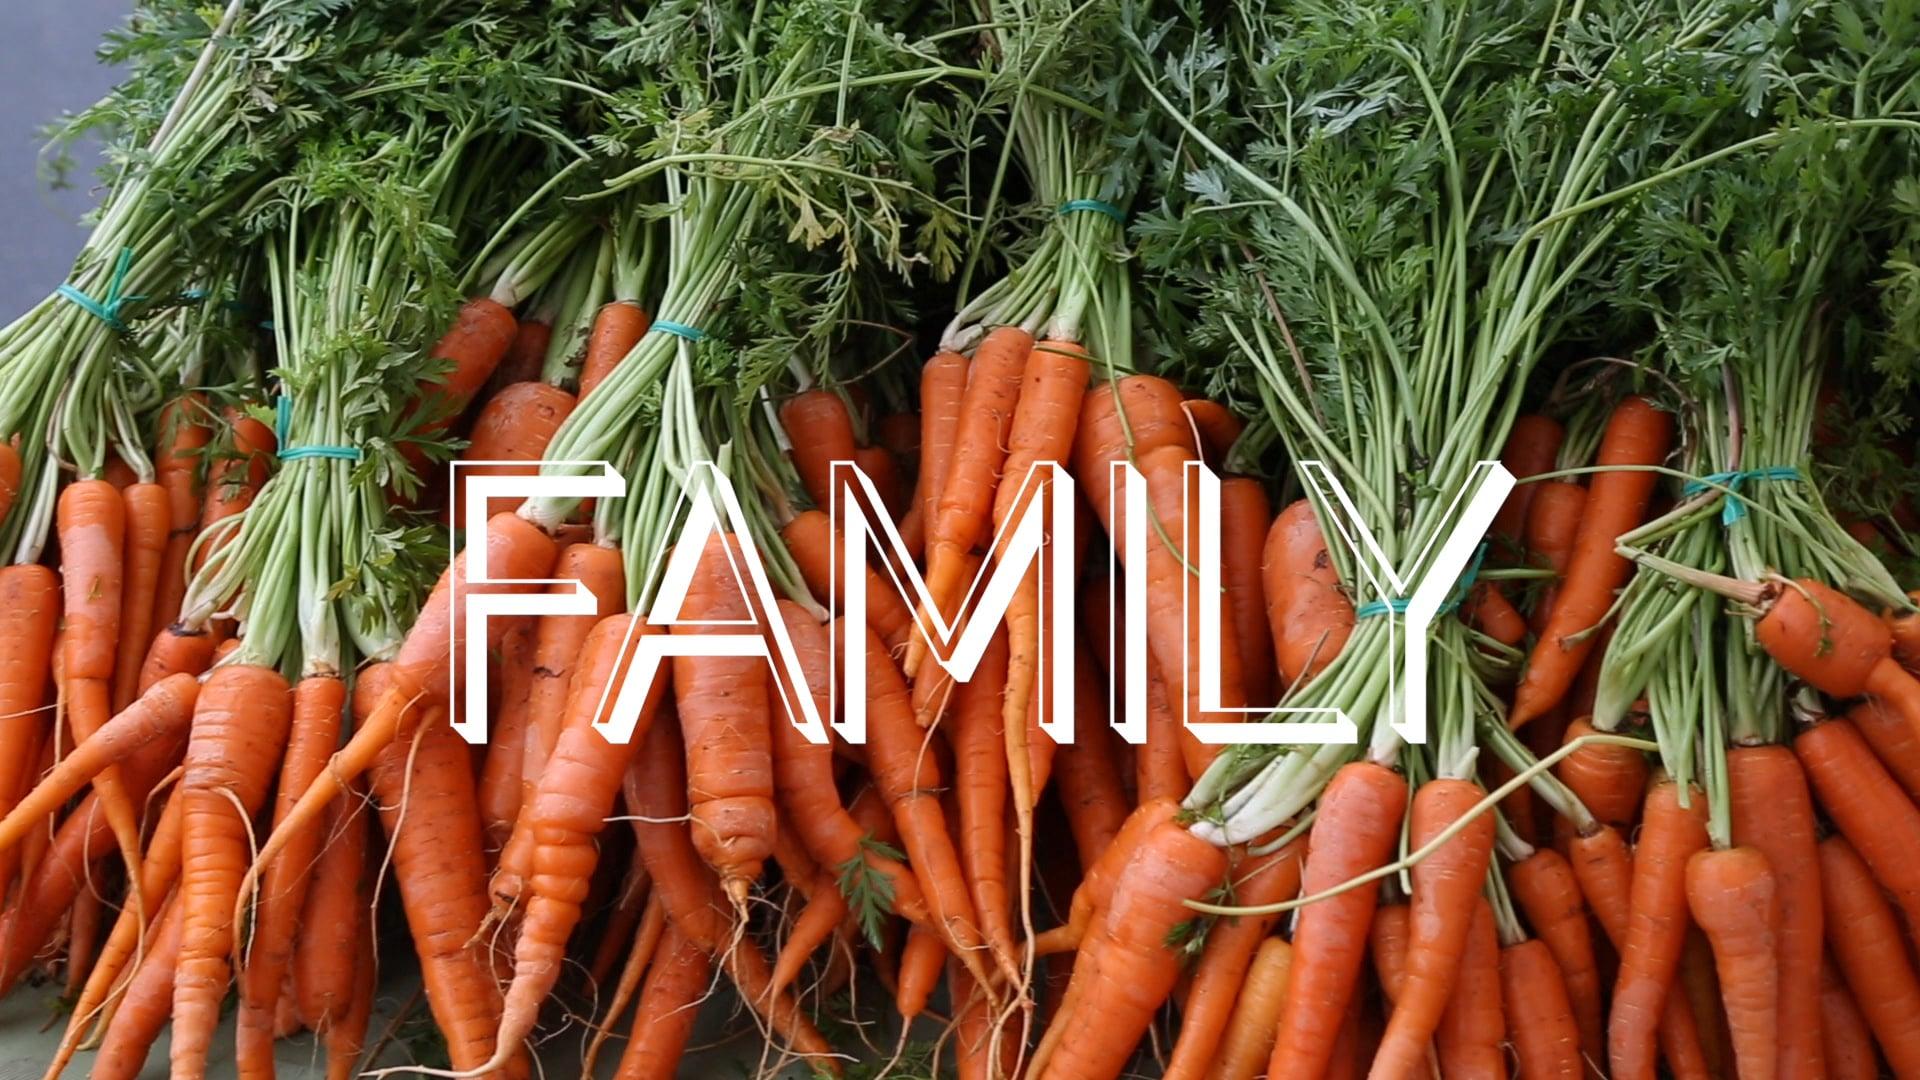 California Farmers' Market Alliance - Feast